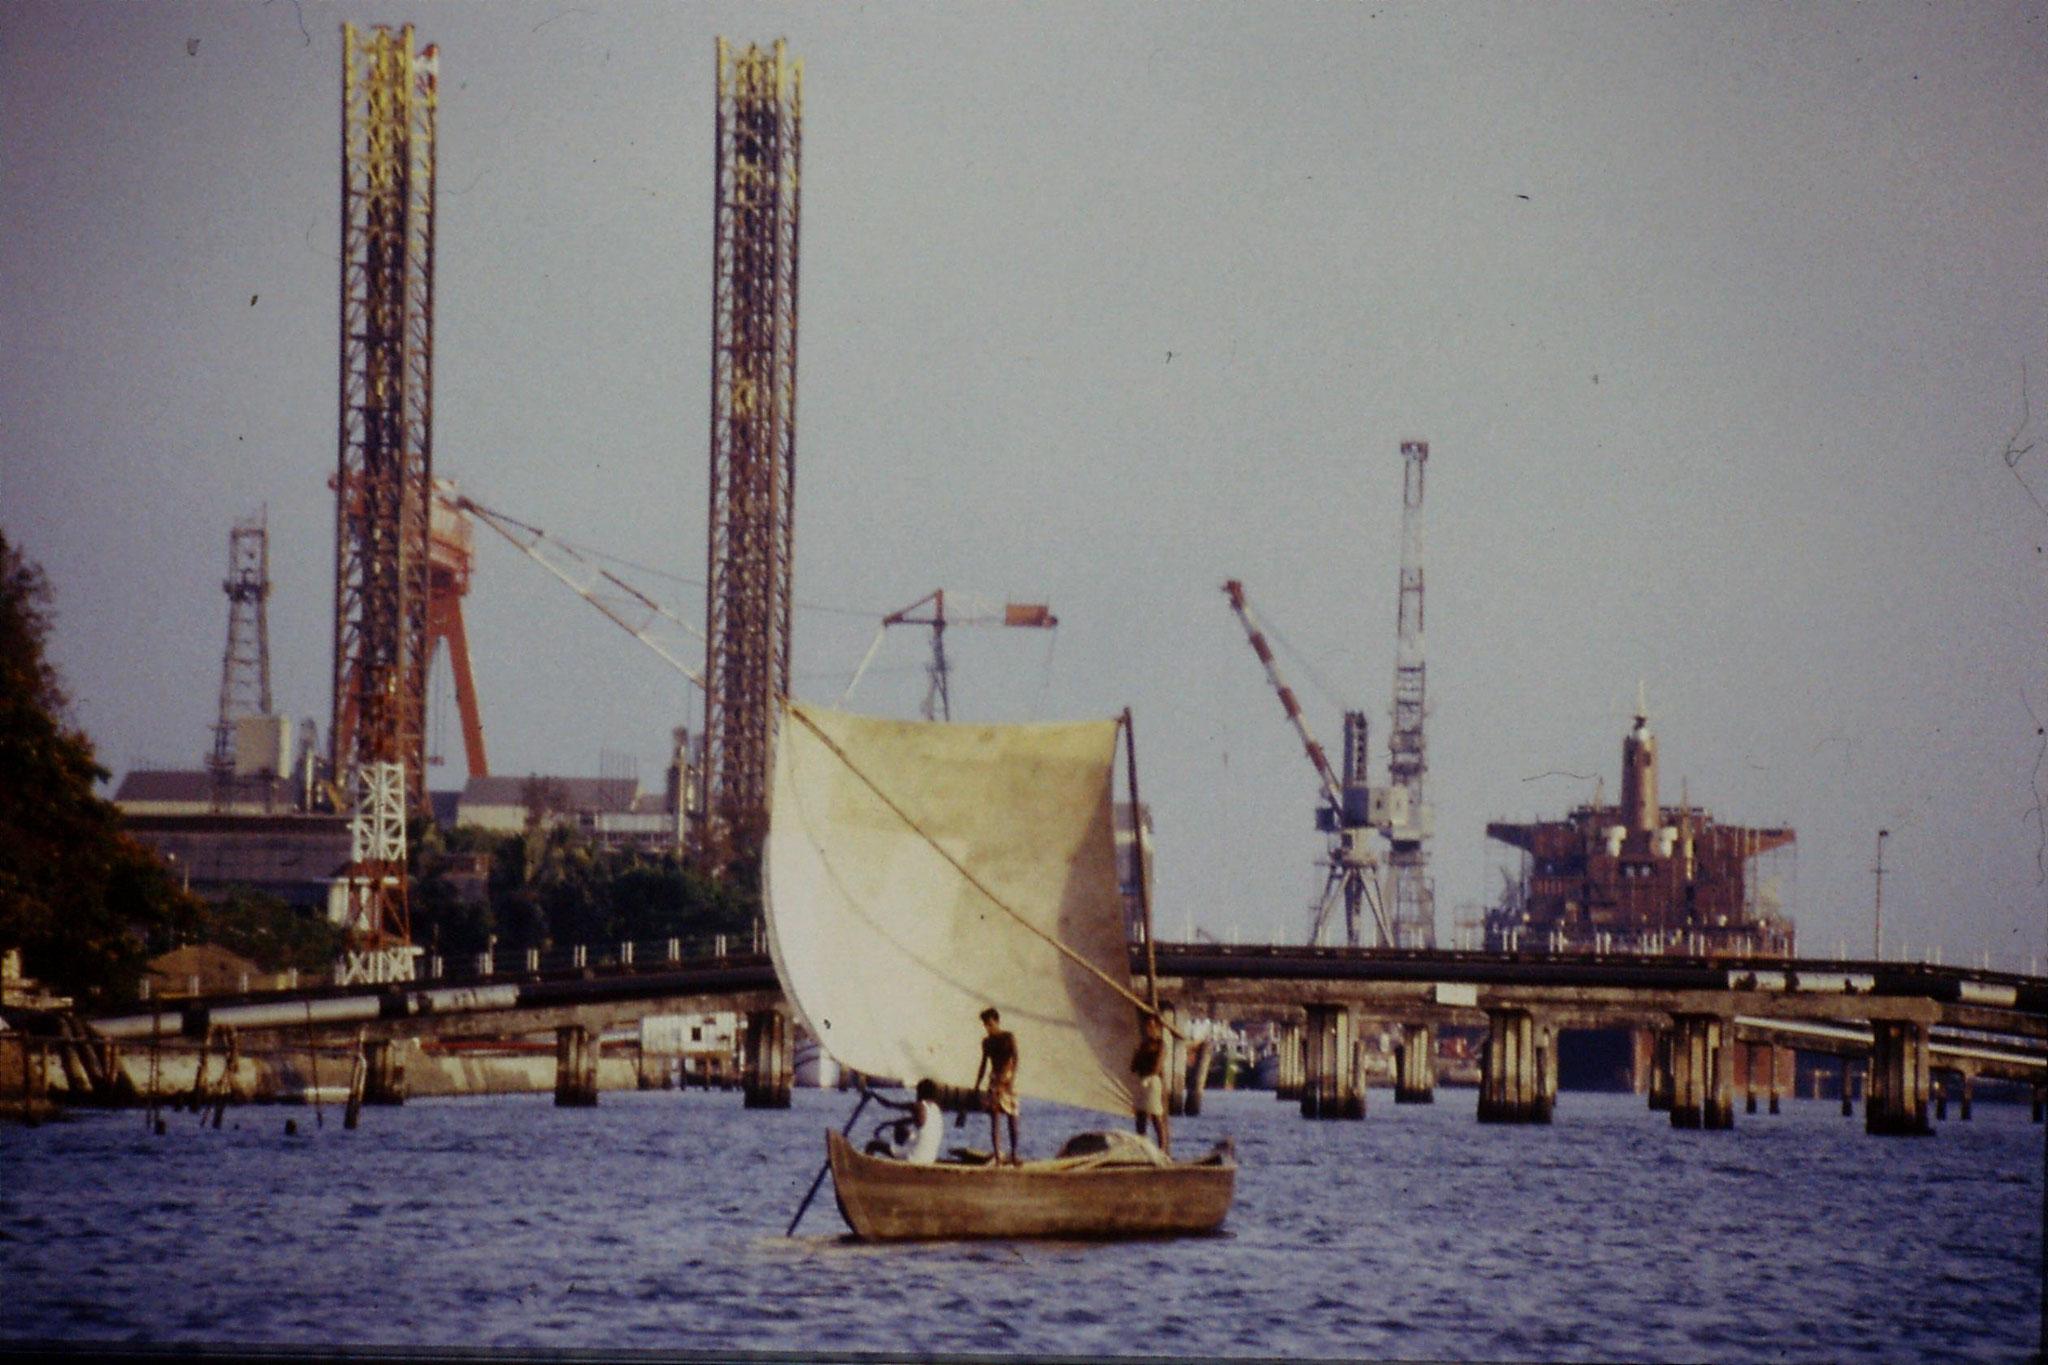 106/15: 24/2/1990 Cochin - sailing boat off Erkunacalam